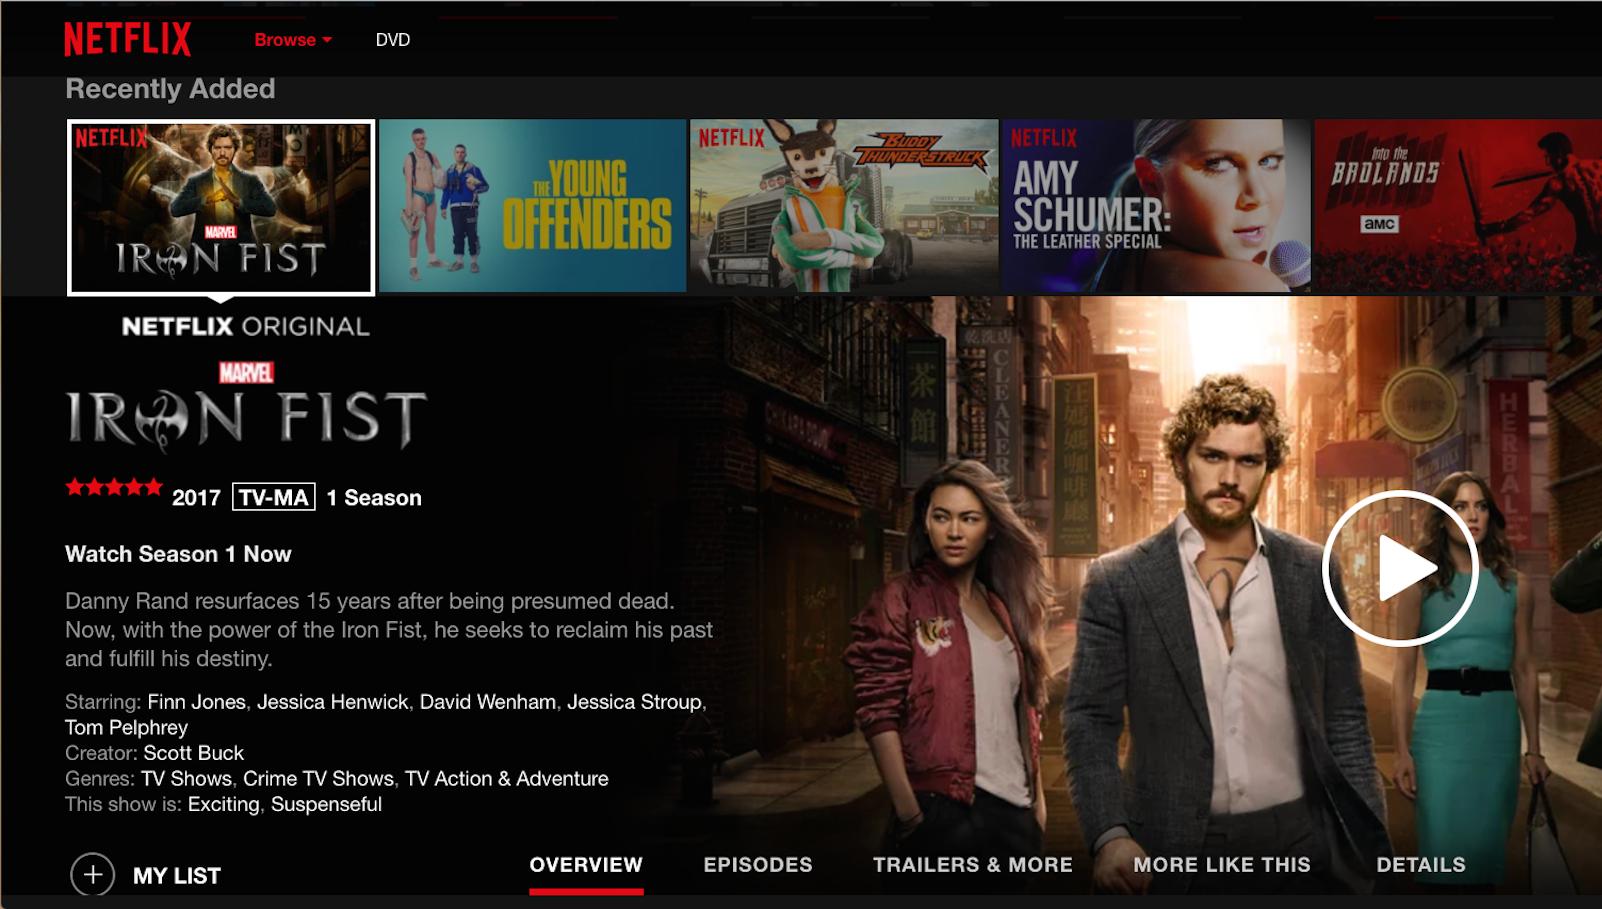 Netflix stars